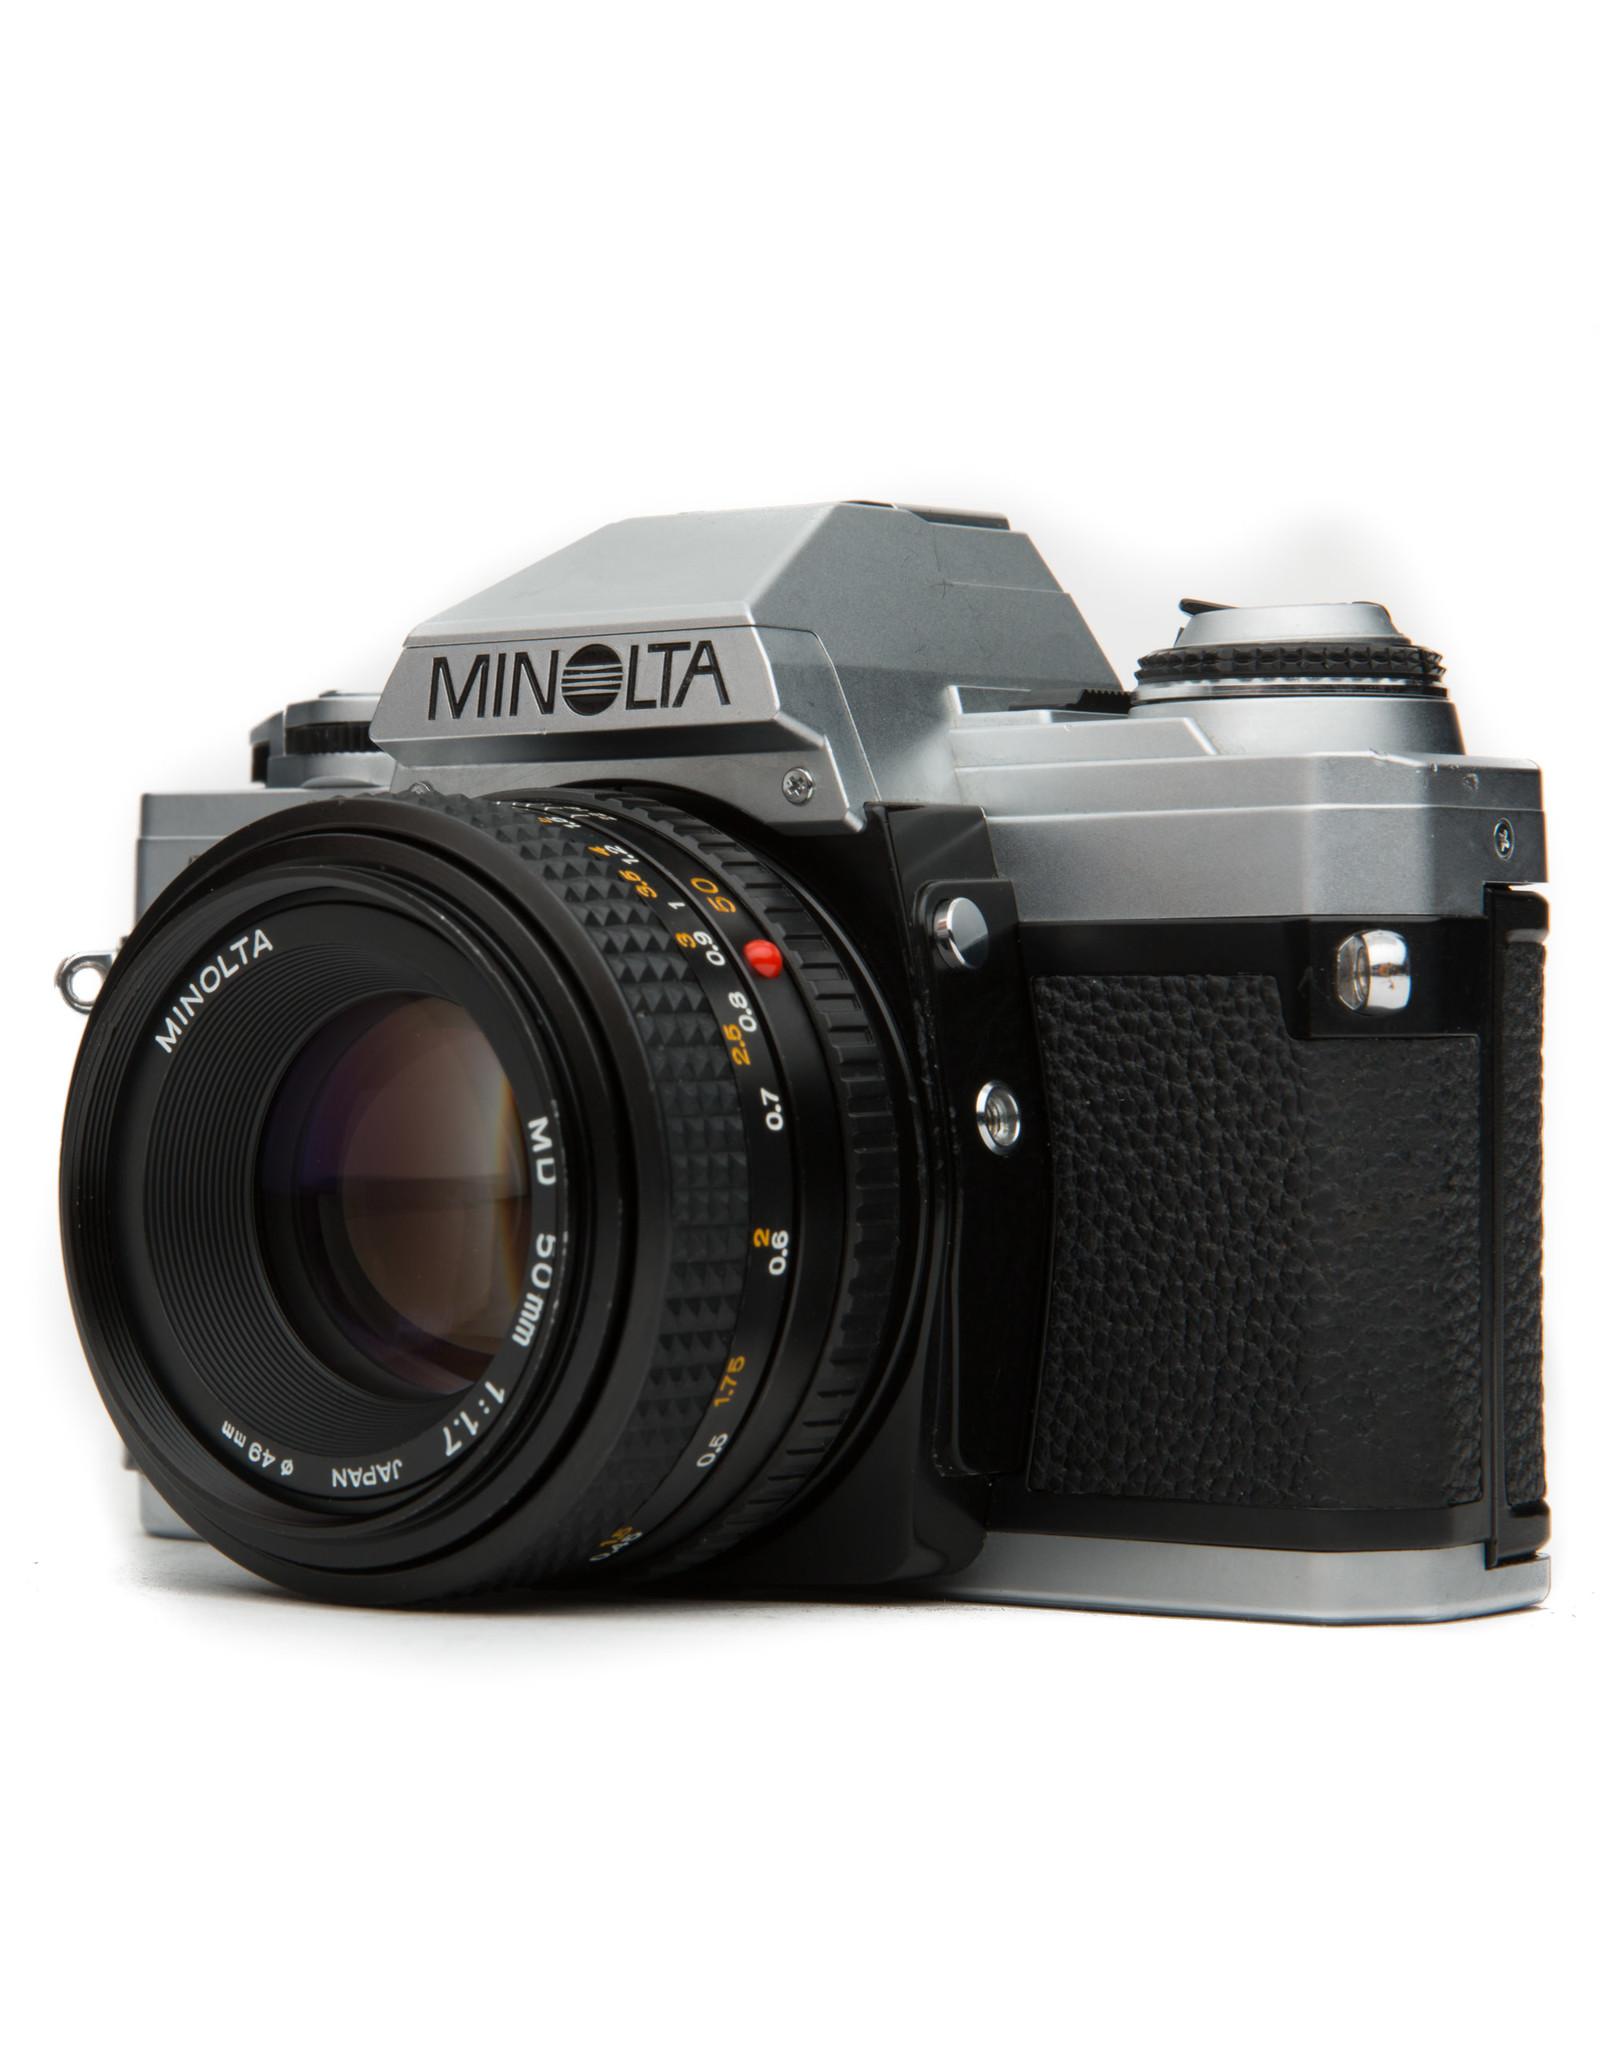 Minolta MIinolta X-370 35mm Camera w/50mm f2 Lens